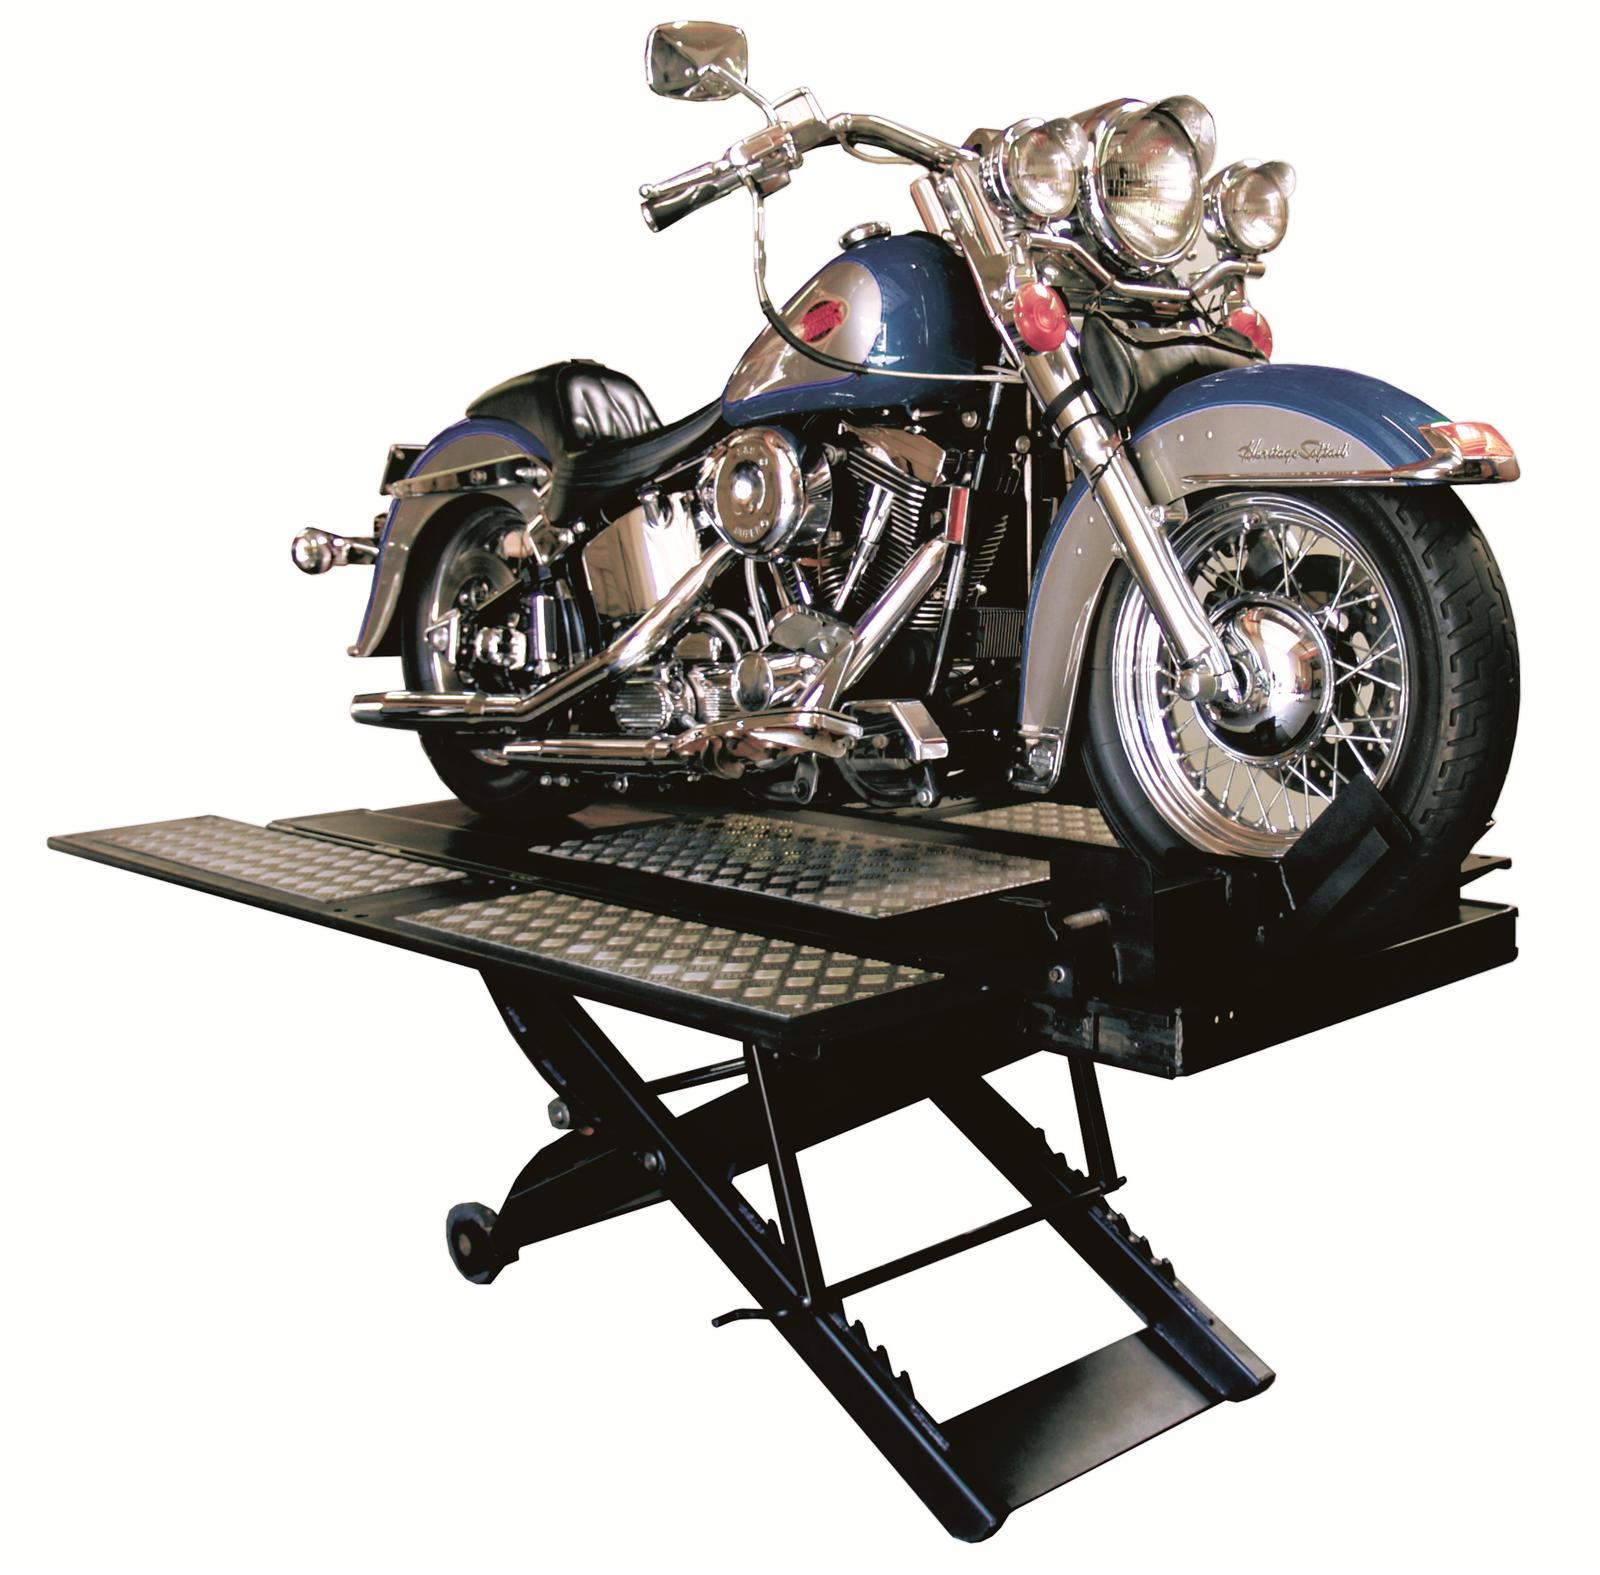 Dannmar MaxJax Motorcycle Adapter Kits 1375660